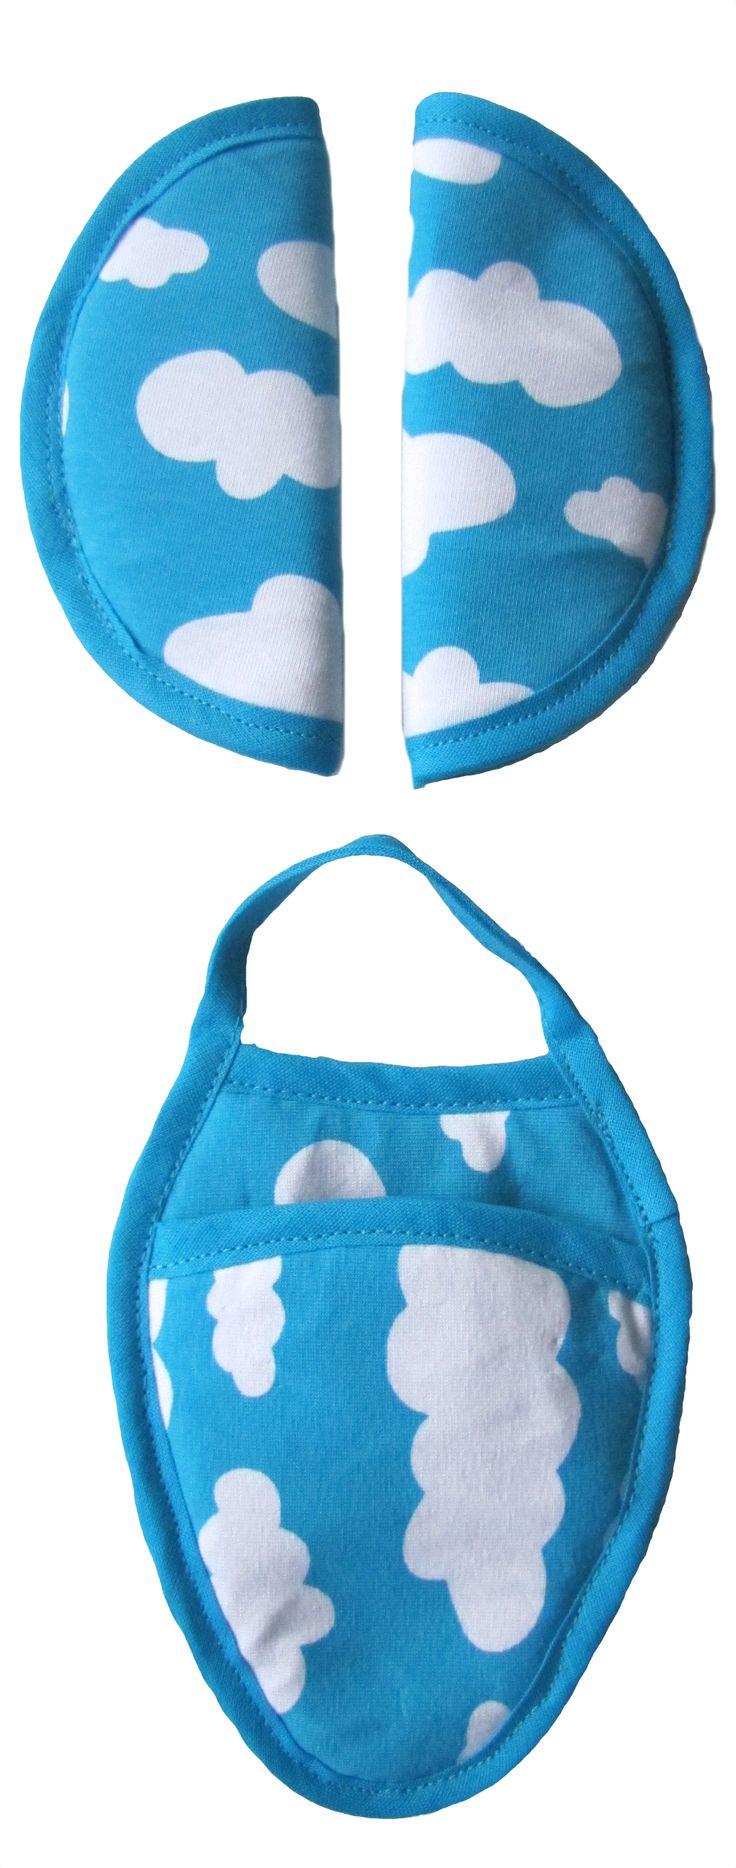 Gordelbeschermers Wolk Aqua strap cover gurtpolster car seat maxi cosi